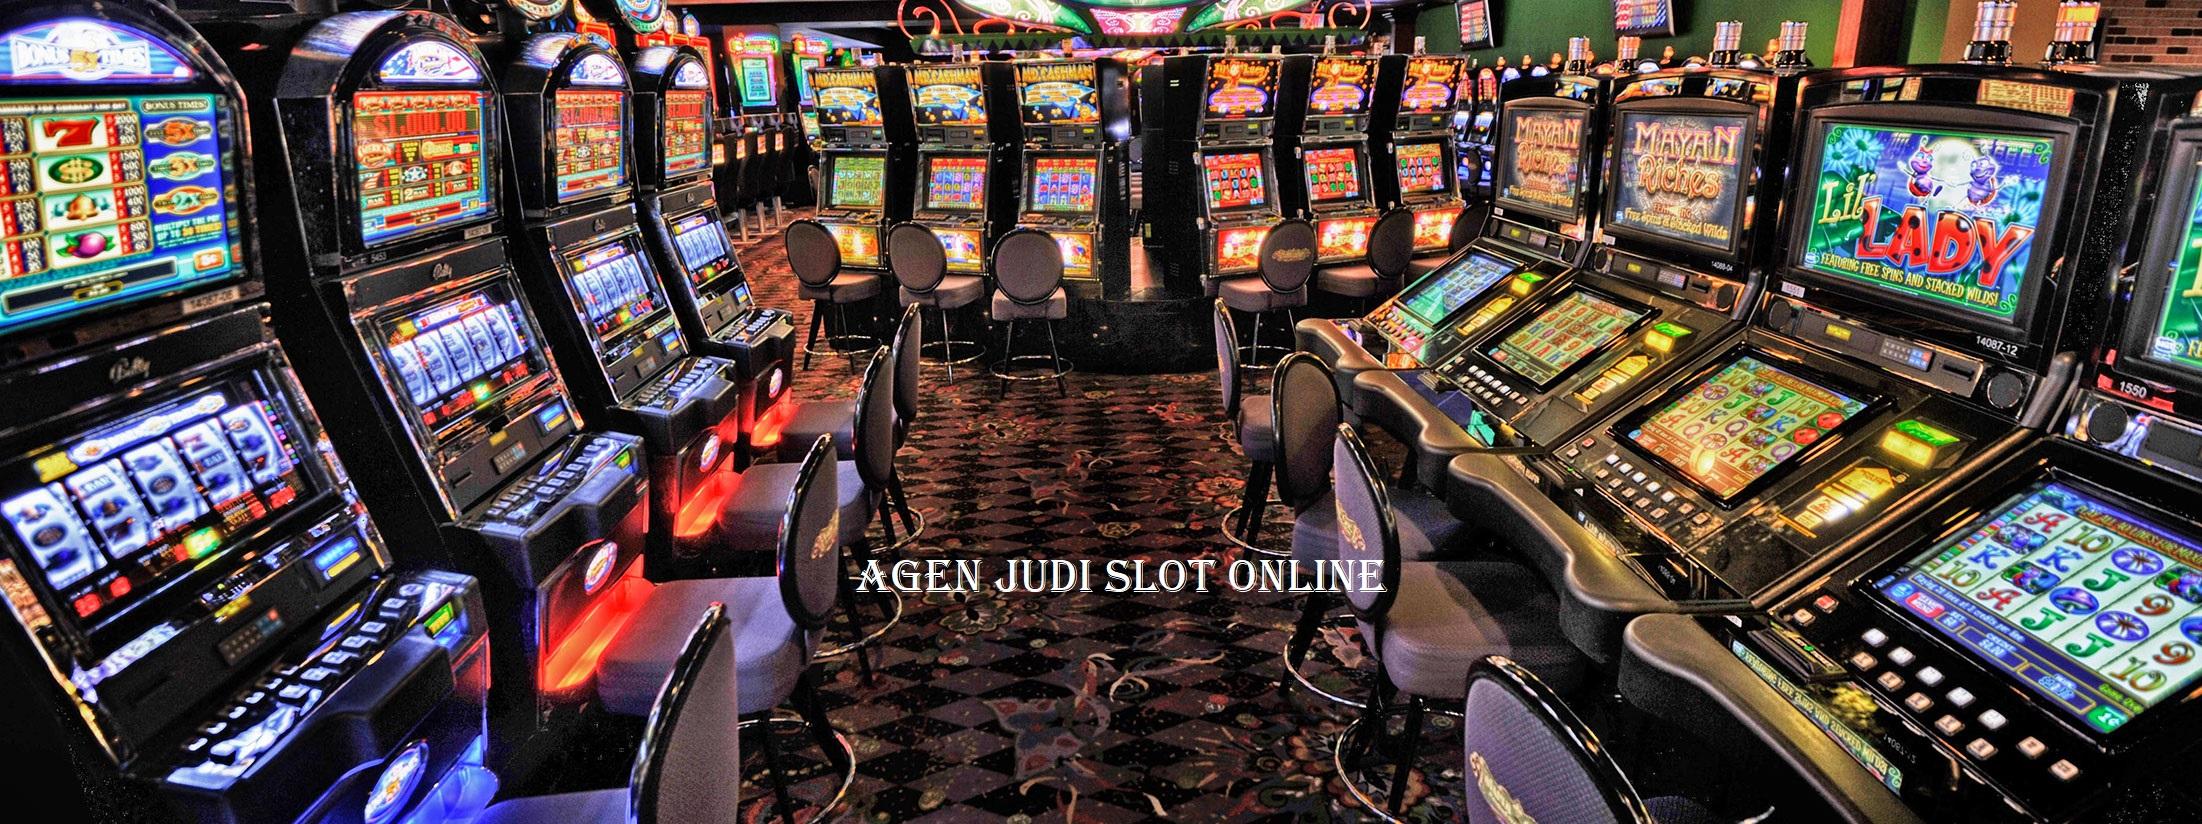 Agen Slot Online Mesin